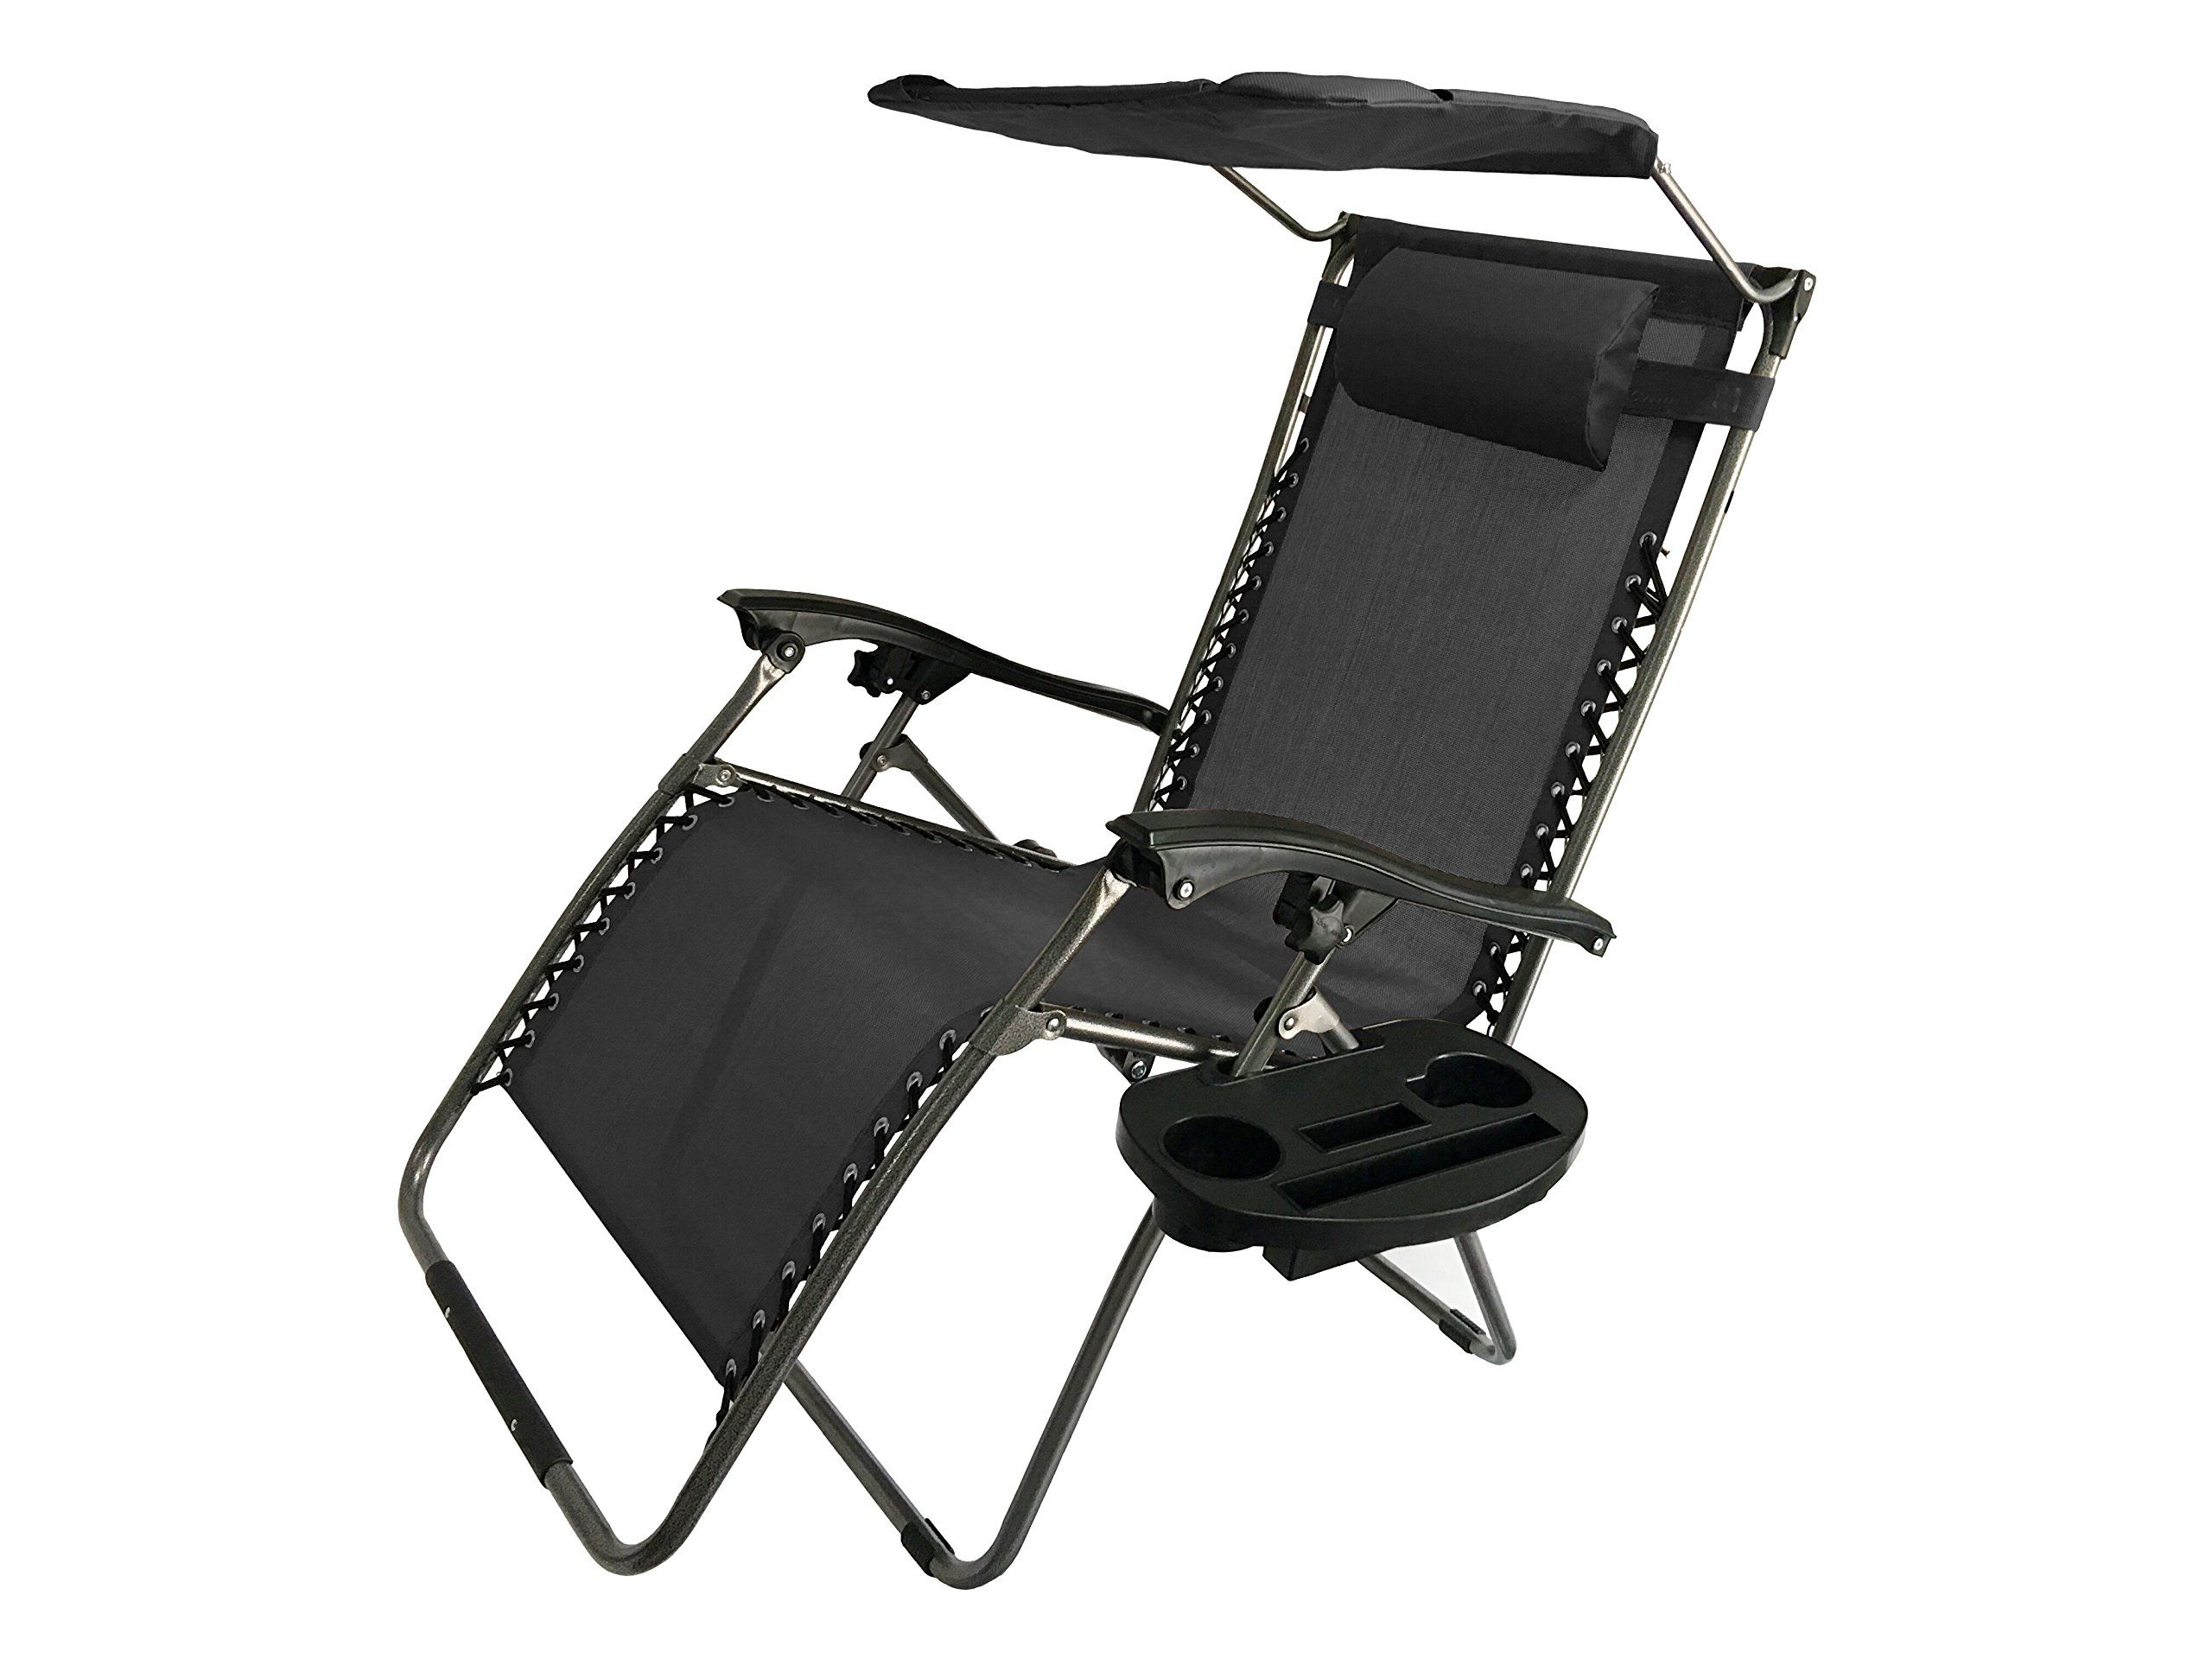 Akari Decor Extra Large Oversized Xl 3pcs Zero Gravity Chair Patio